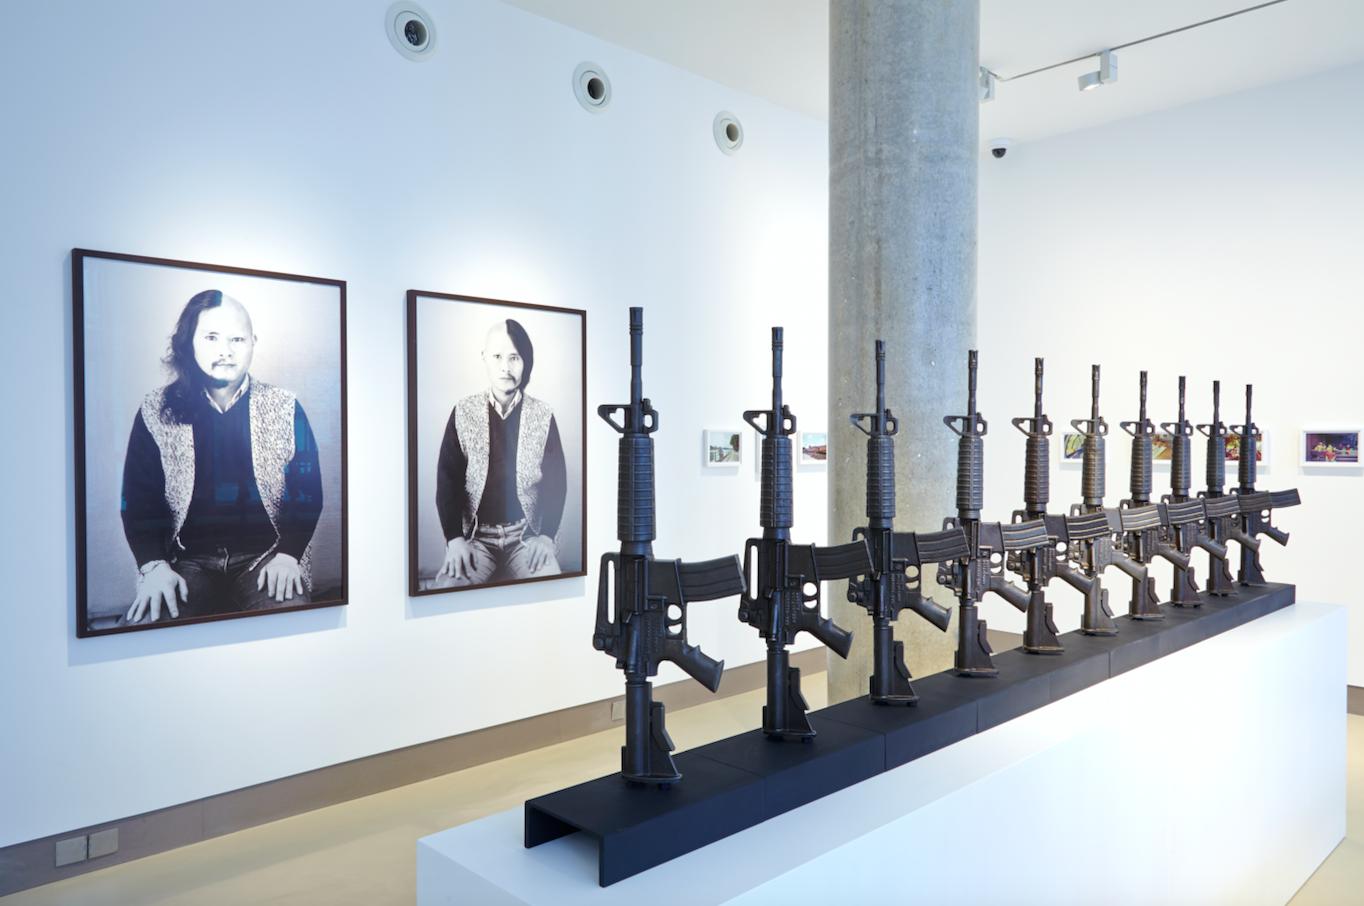 Chu Enoki : Enoki Chu, Installation View, White Rainbow 2014.  Photo credit: Tom de Gay